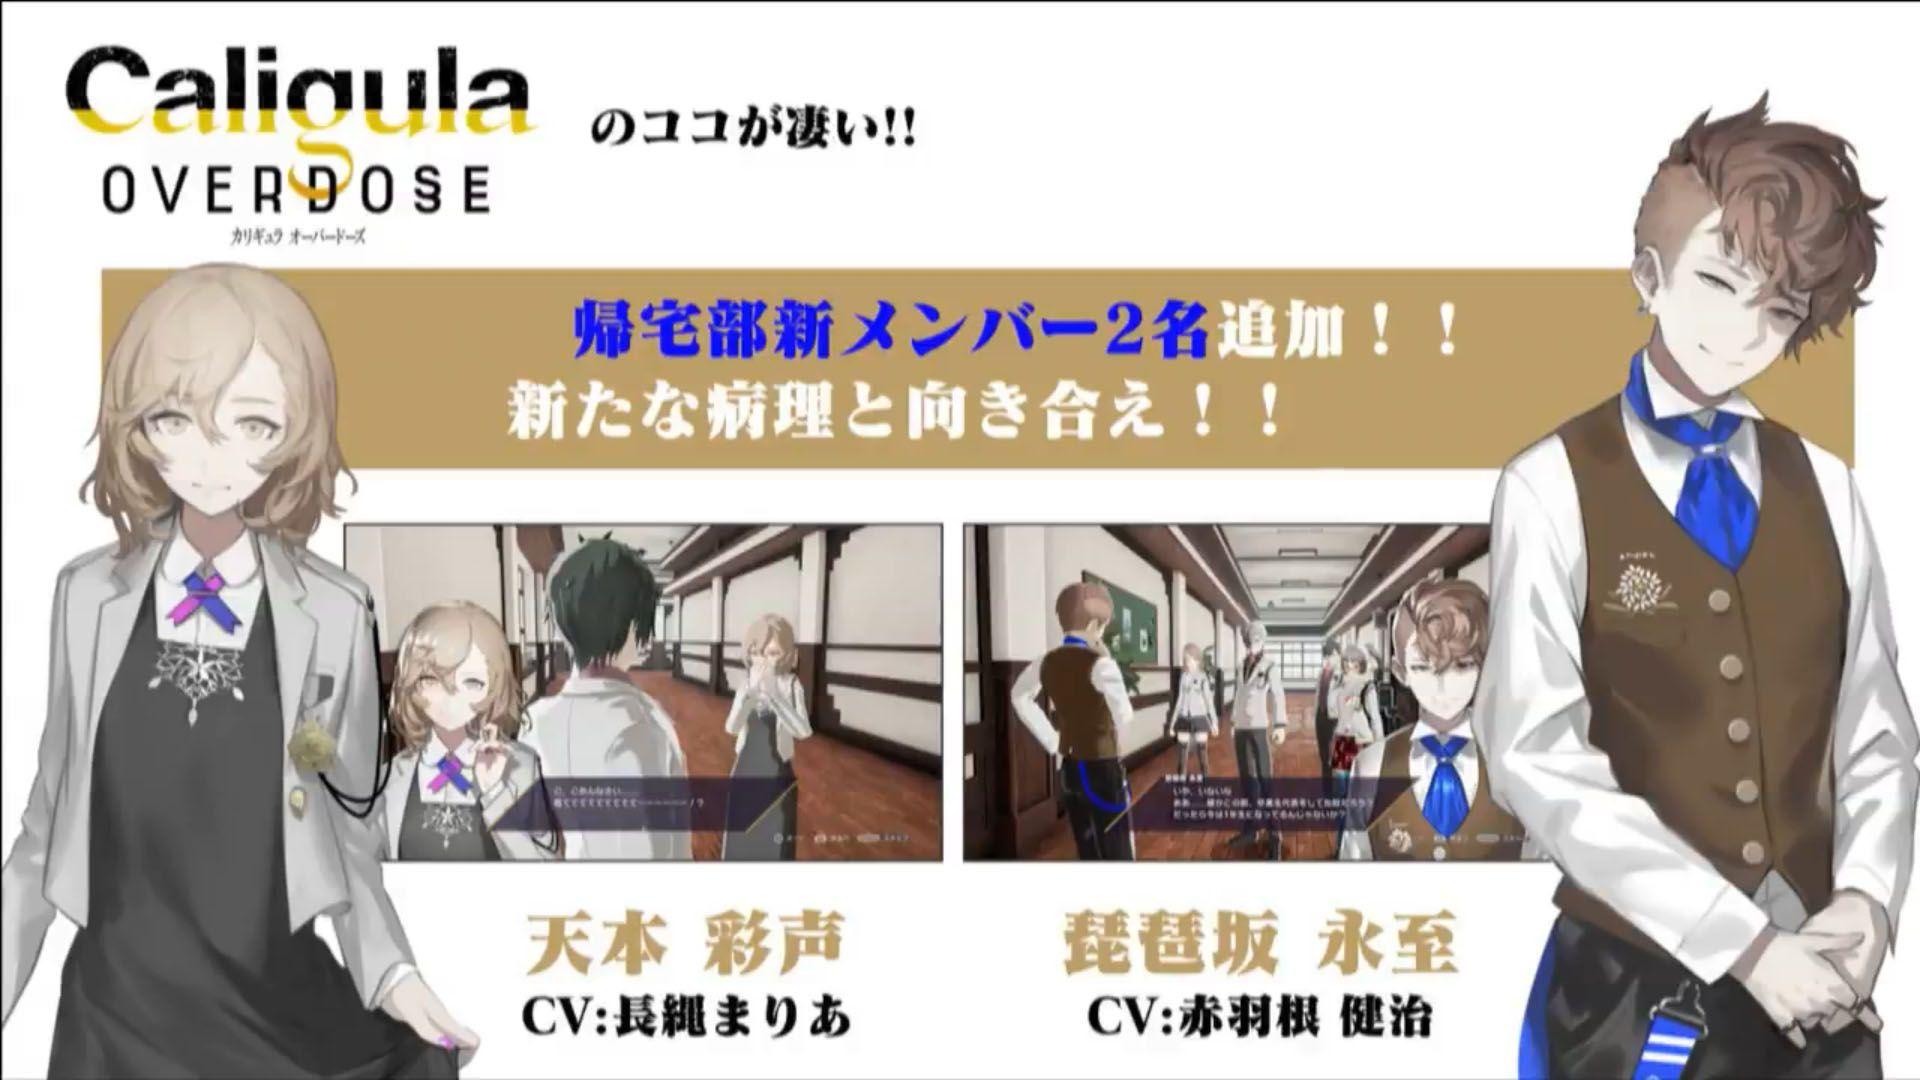 Caligula-Overdose-PS4-Ann_Slides_11-17-17_004